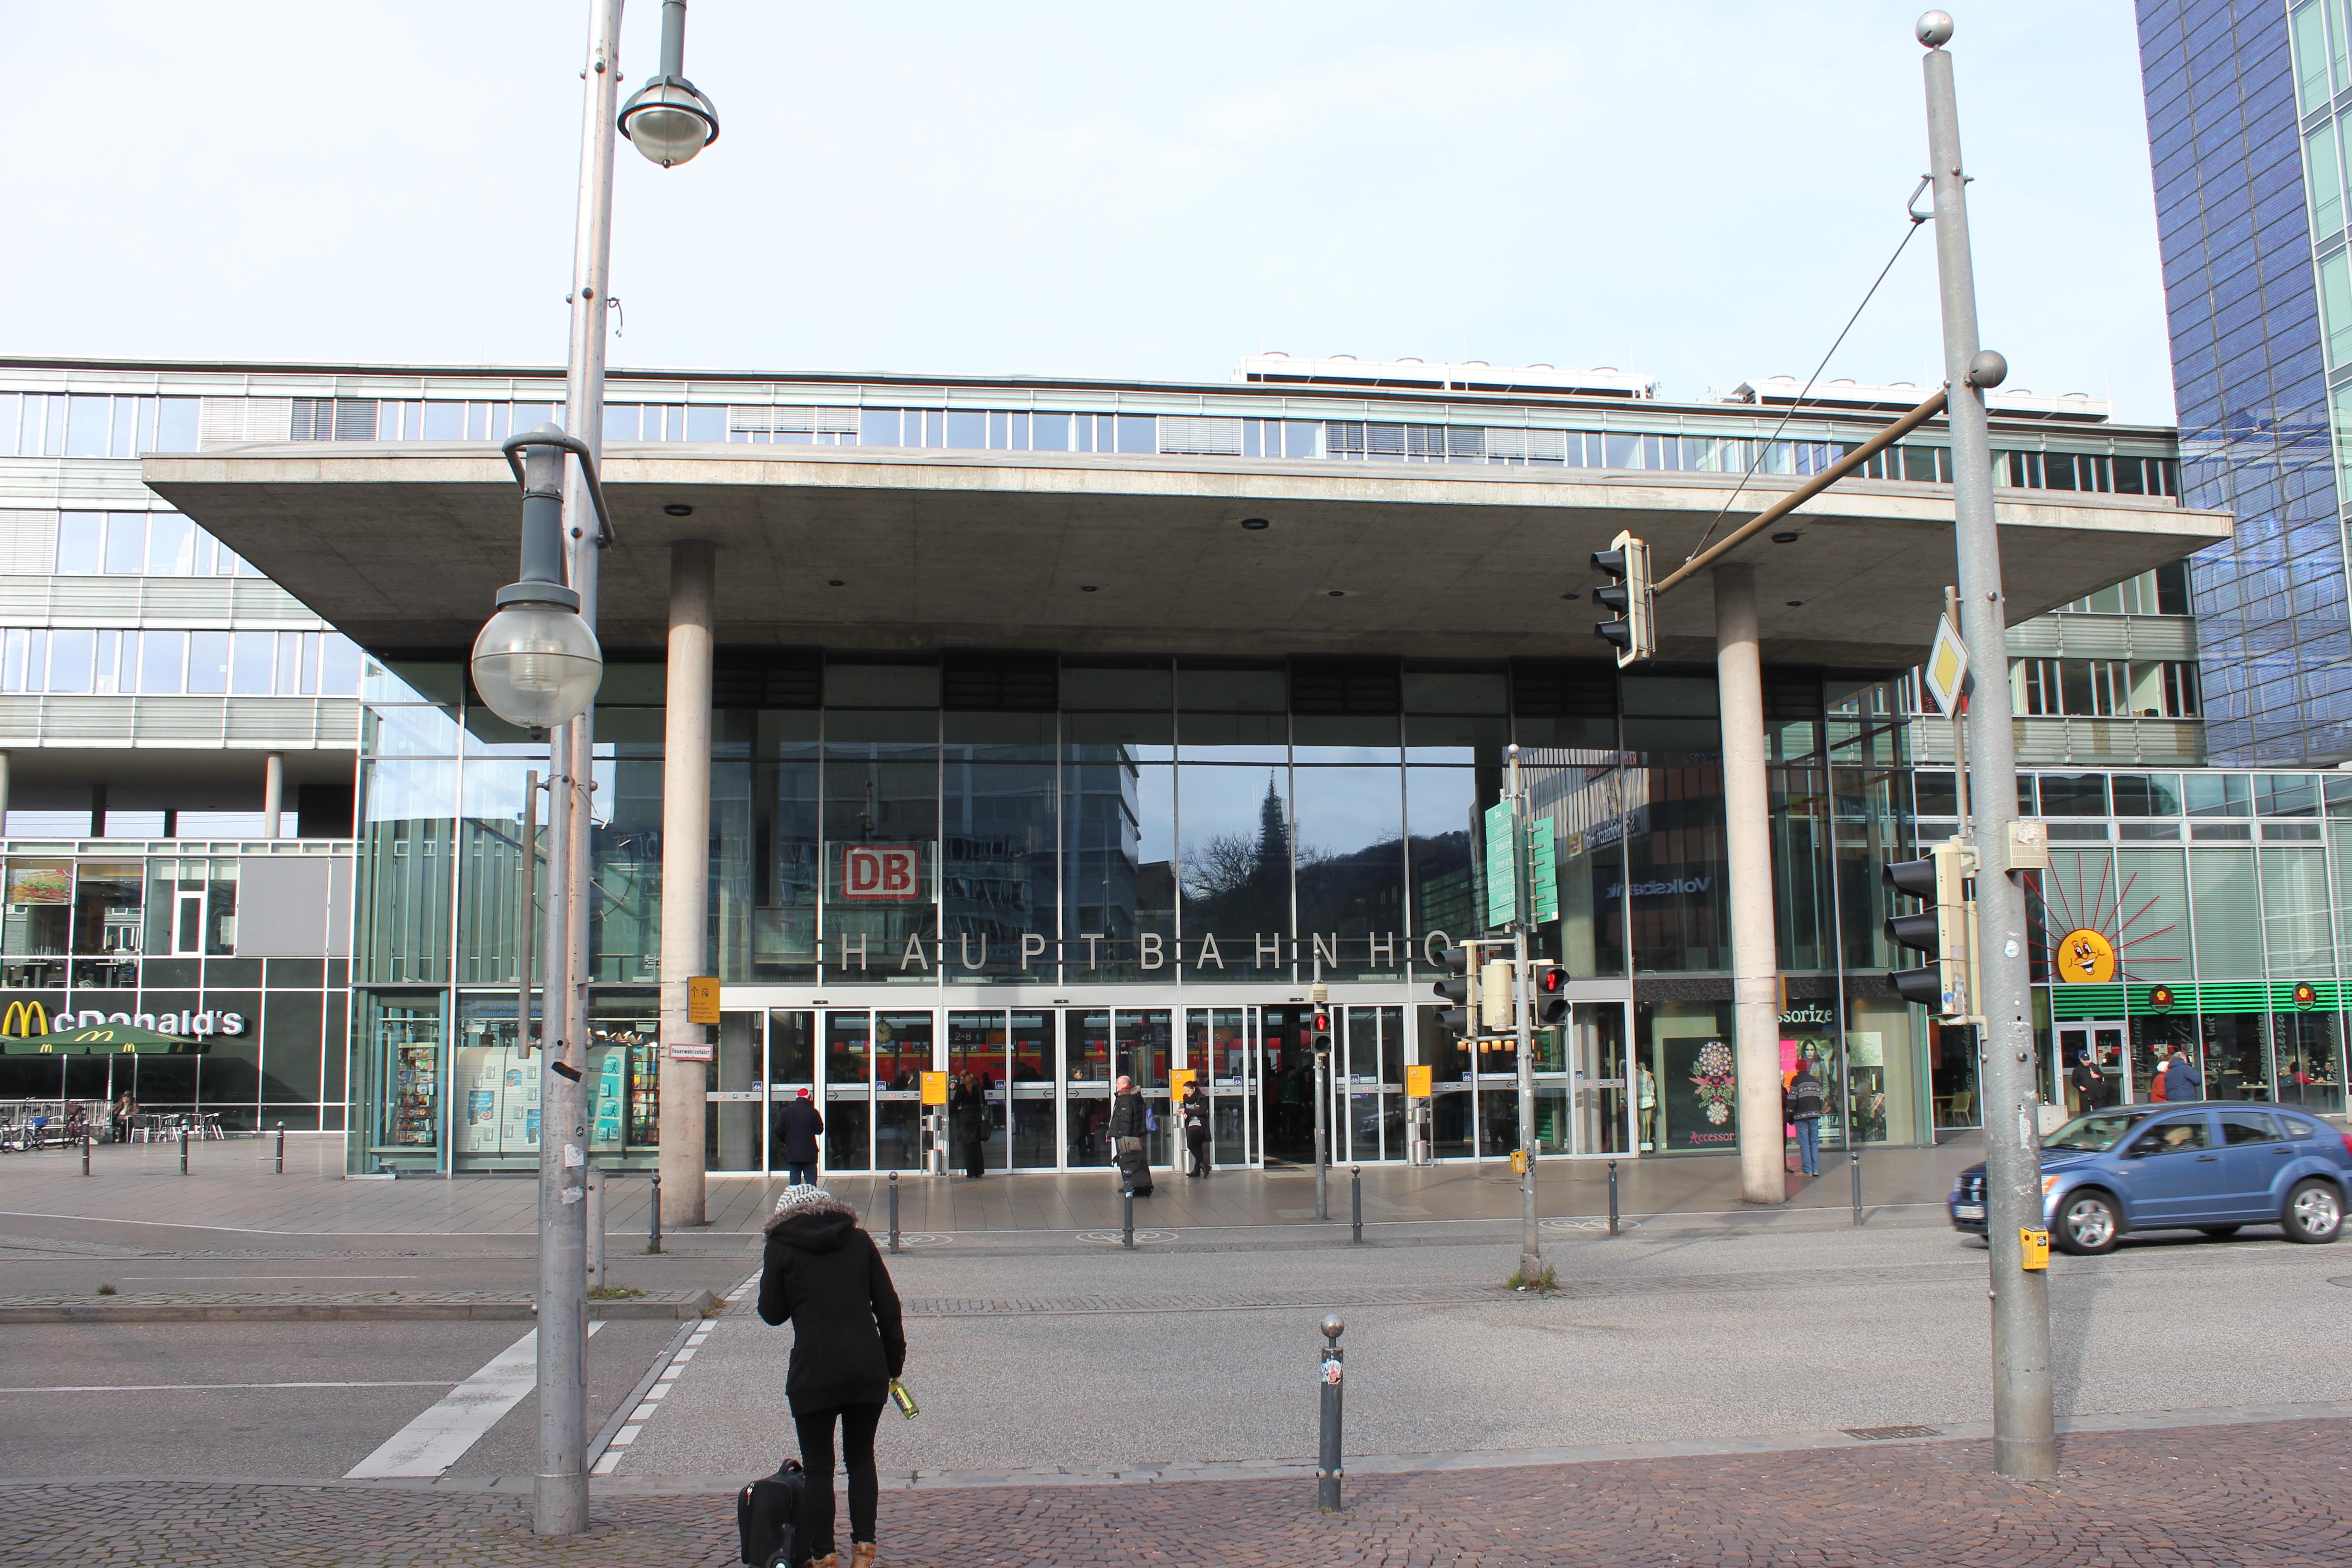 Bahnhof_01